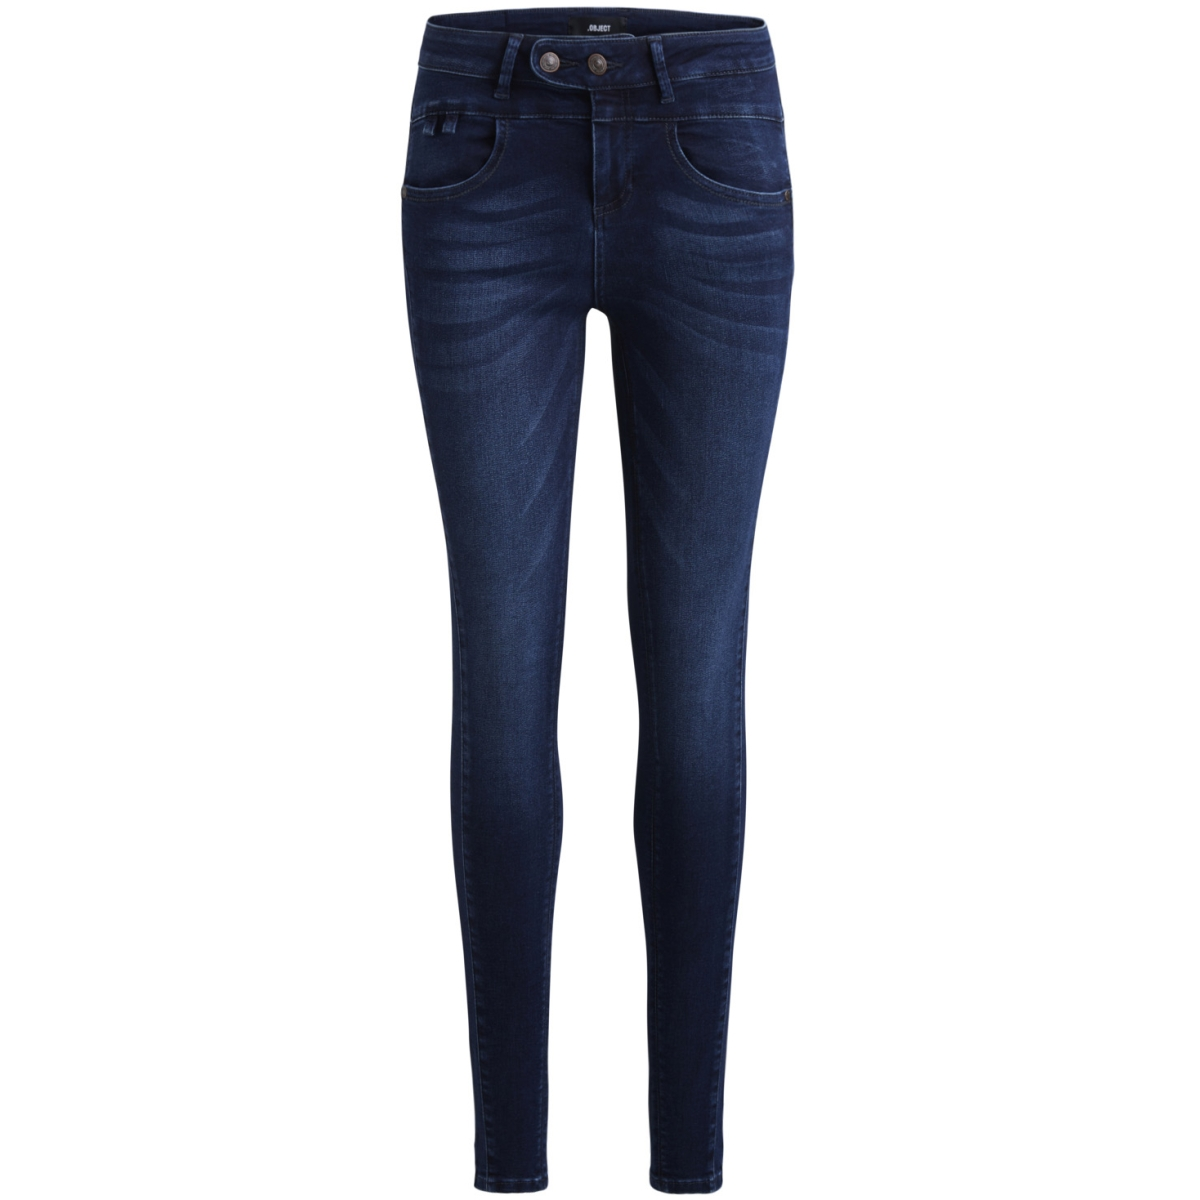 objup-c super stretch obb266 93 div 23026038 object jeans dark blue denim